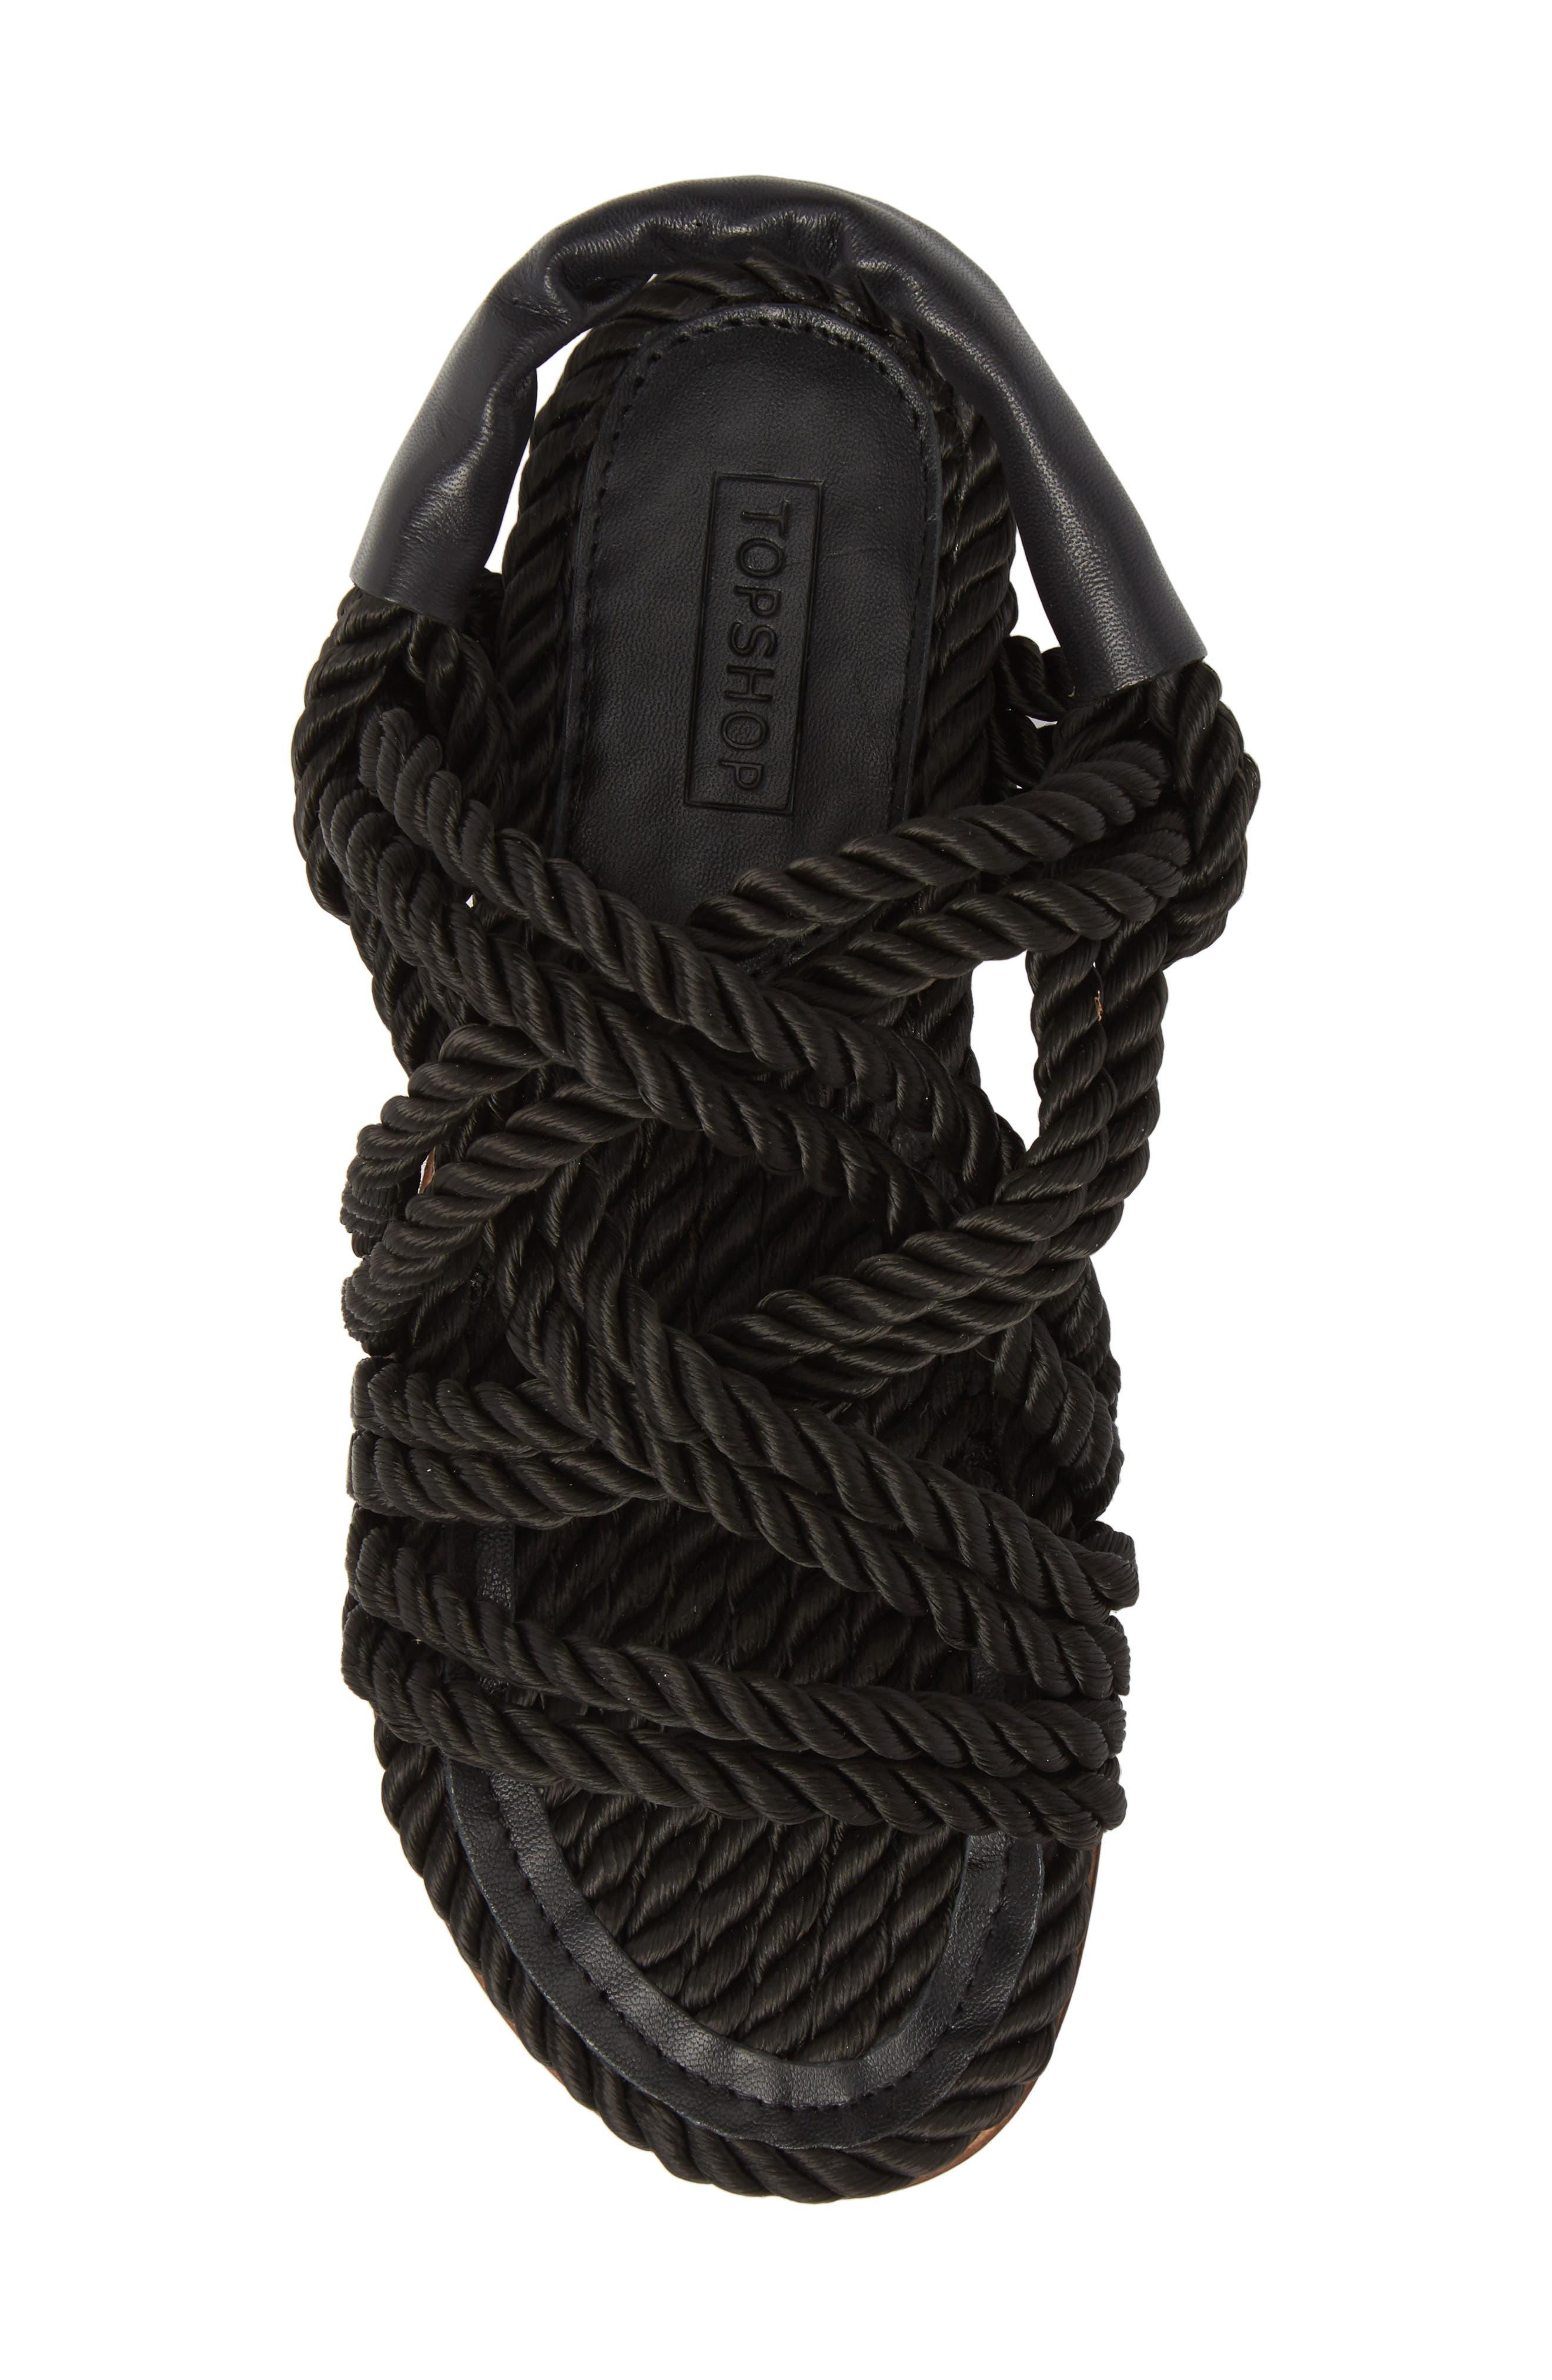 Fiesta Rope Flat Sandal,                             Alternate thumbnail 9, color,